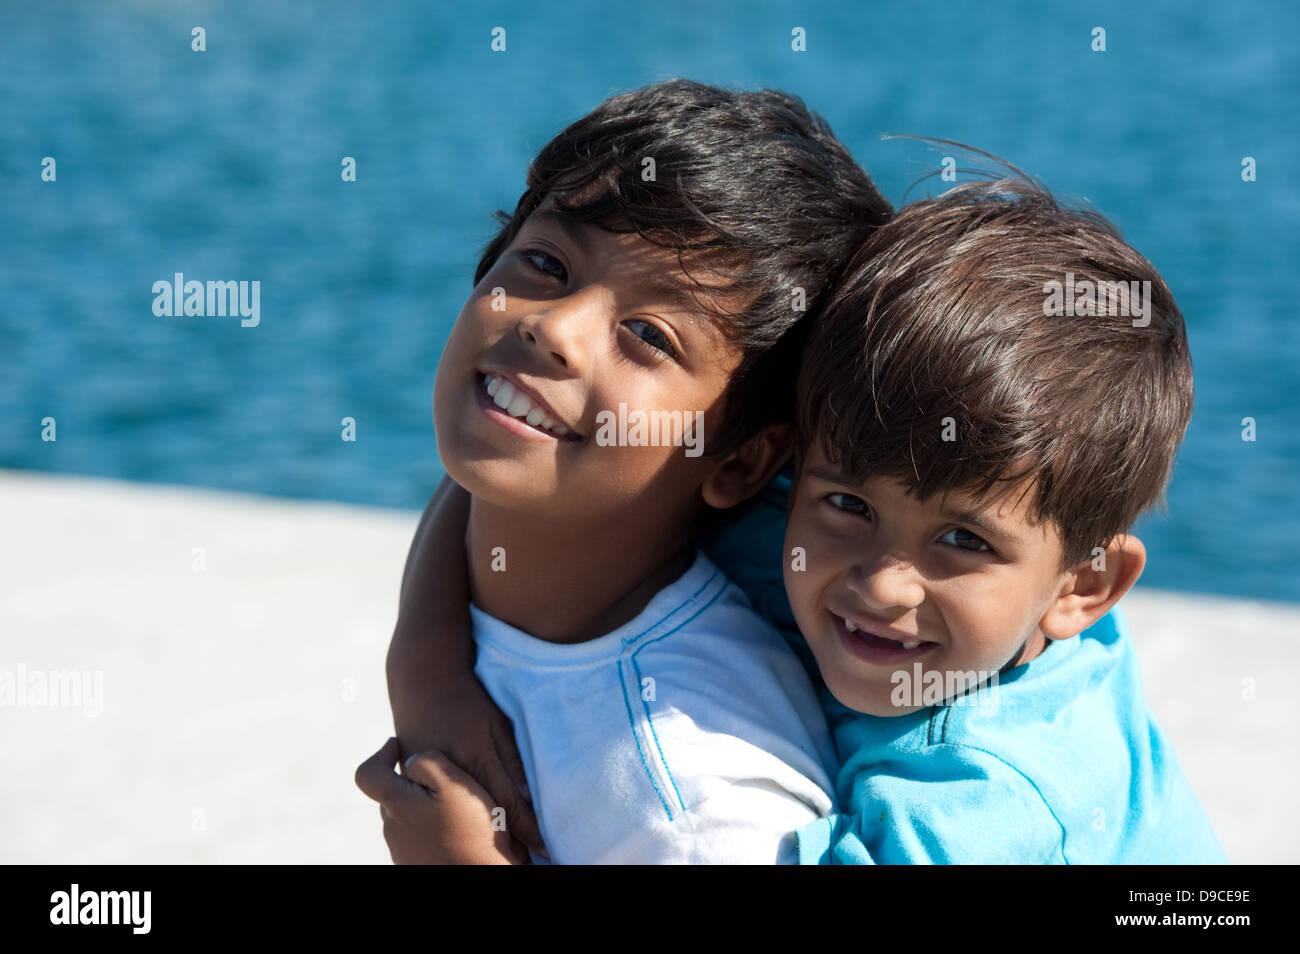 Children, Kalk Bay, False Bay, South Africa - Stock Image